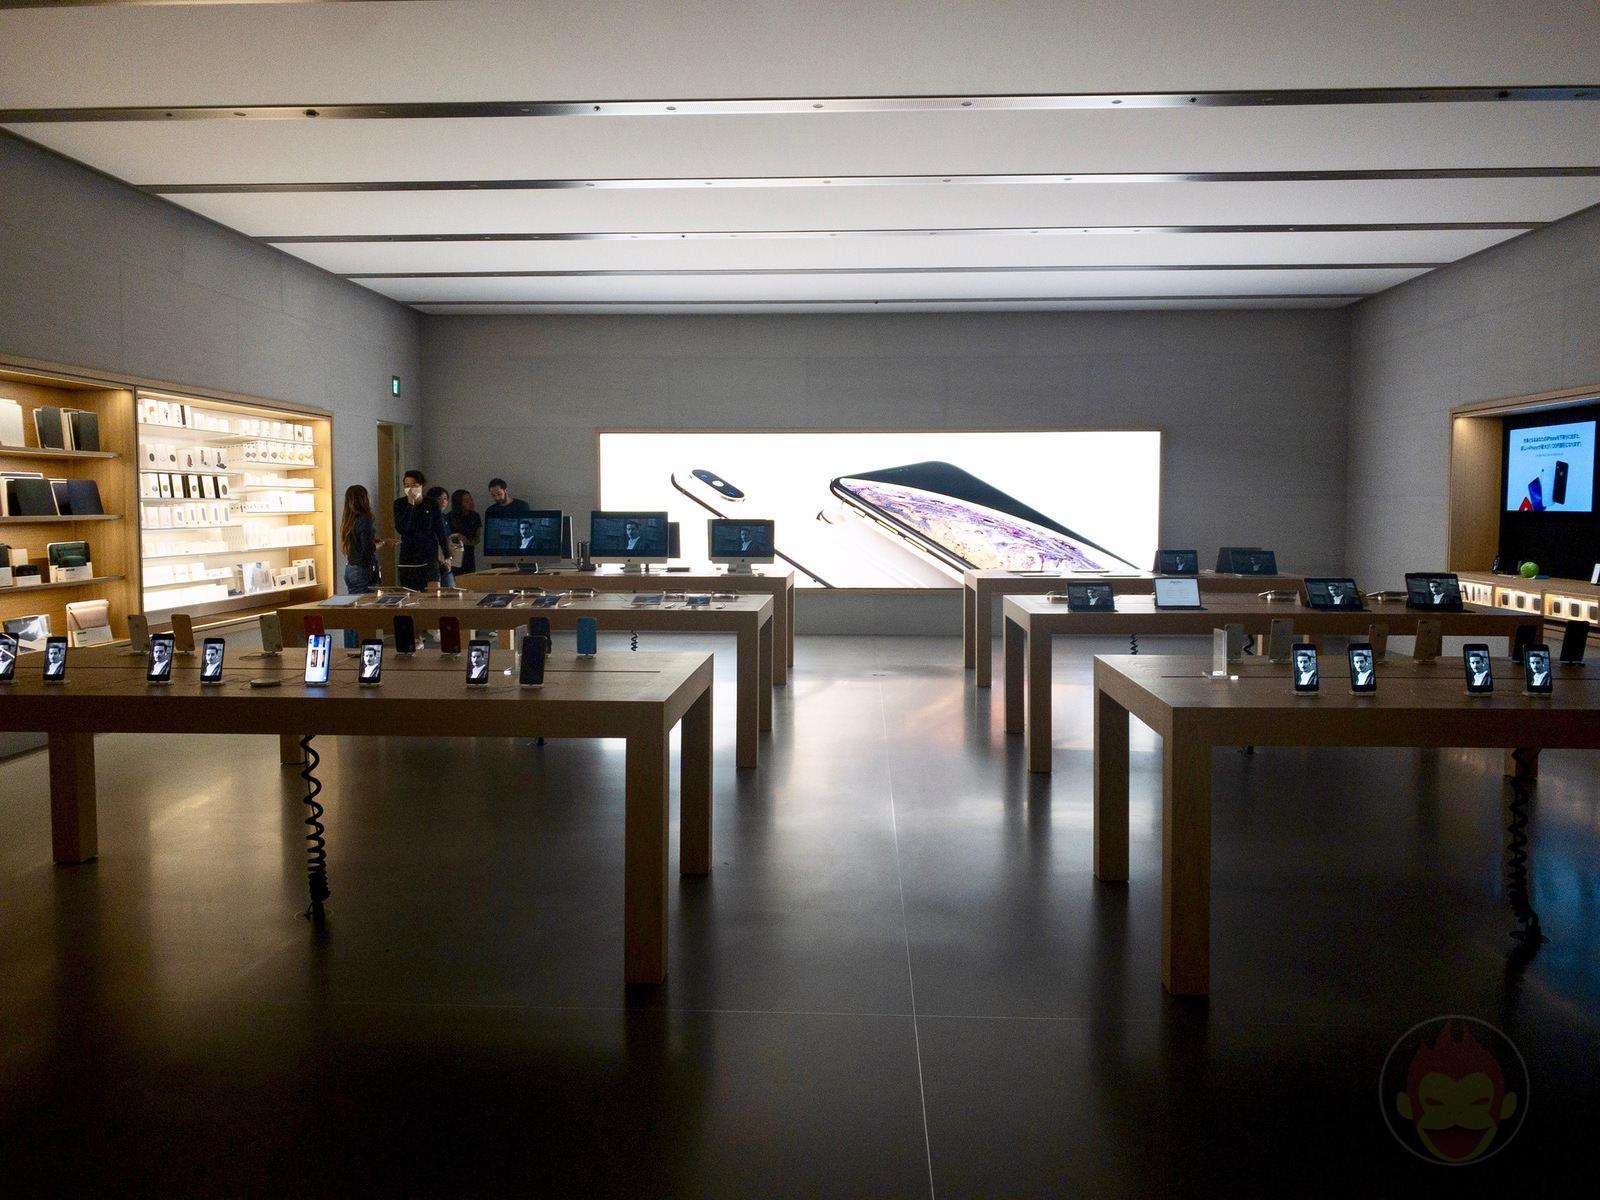 Apple Store Omotesando Basement floor renewal 48